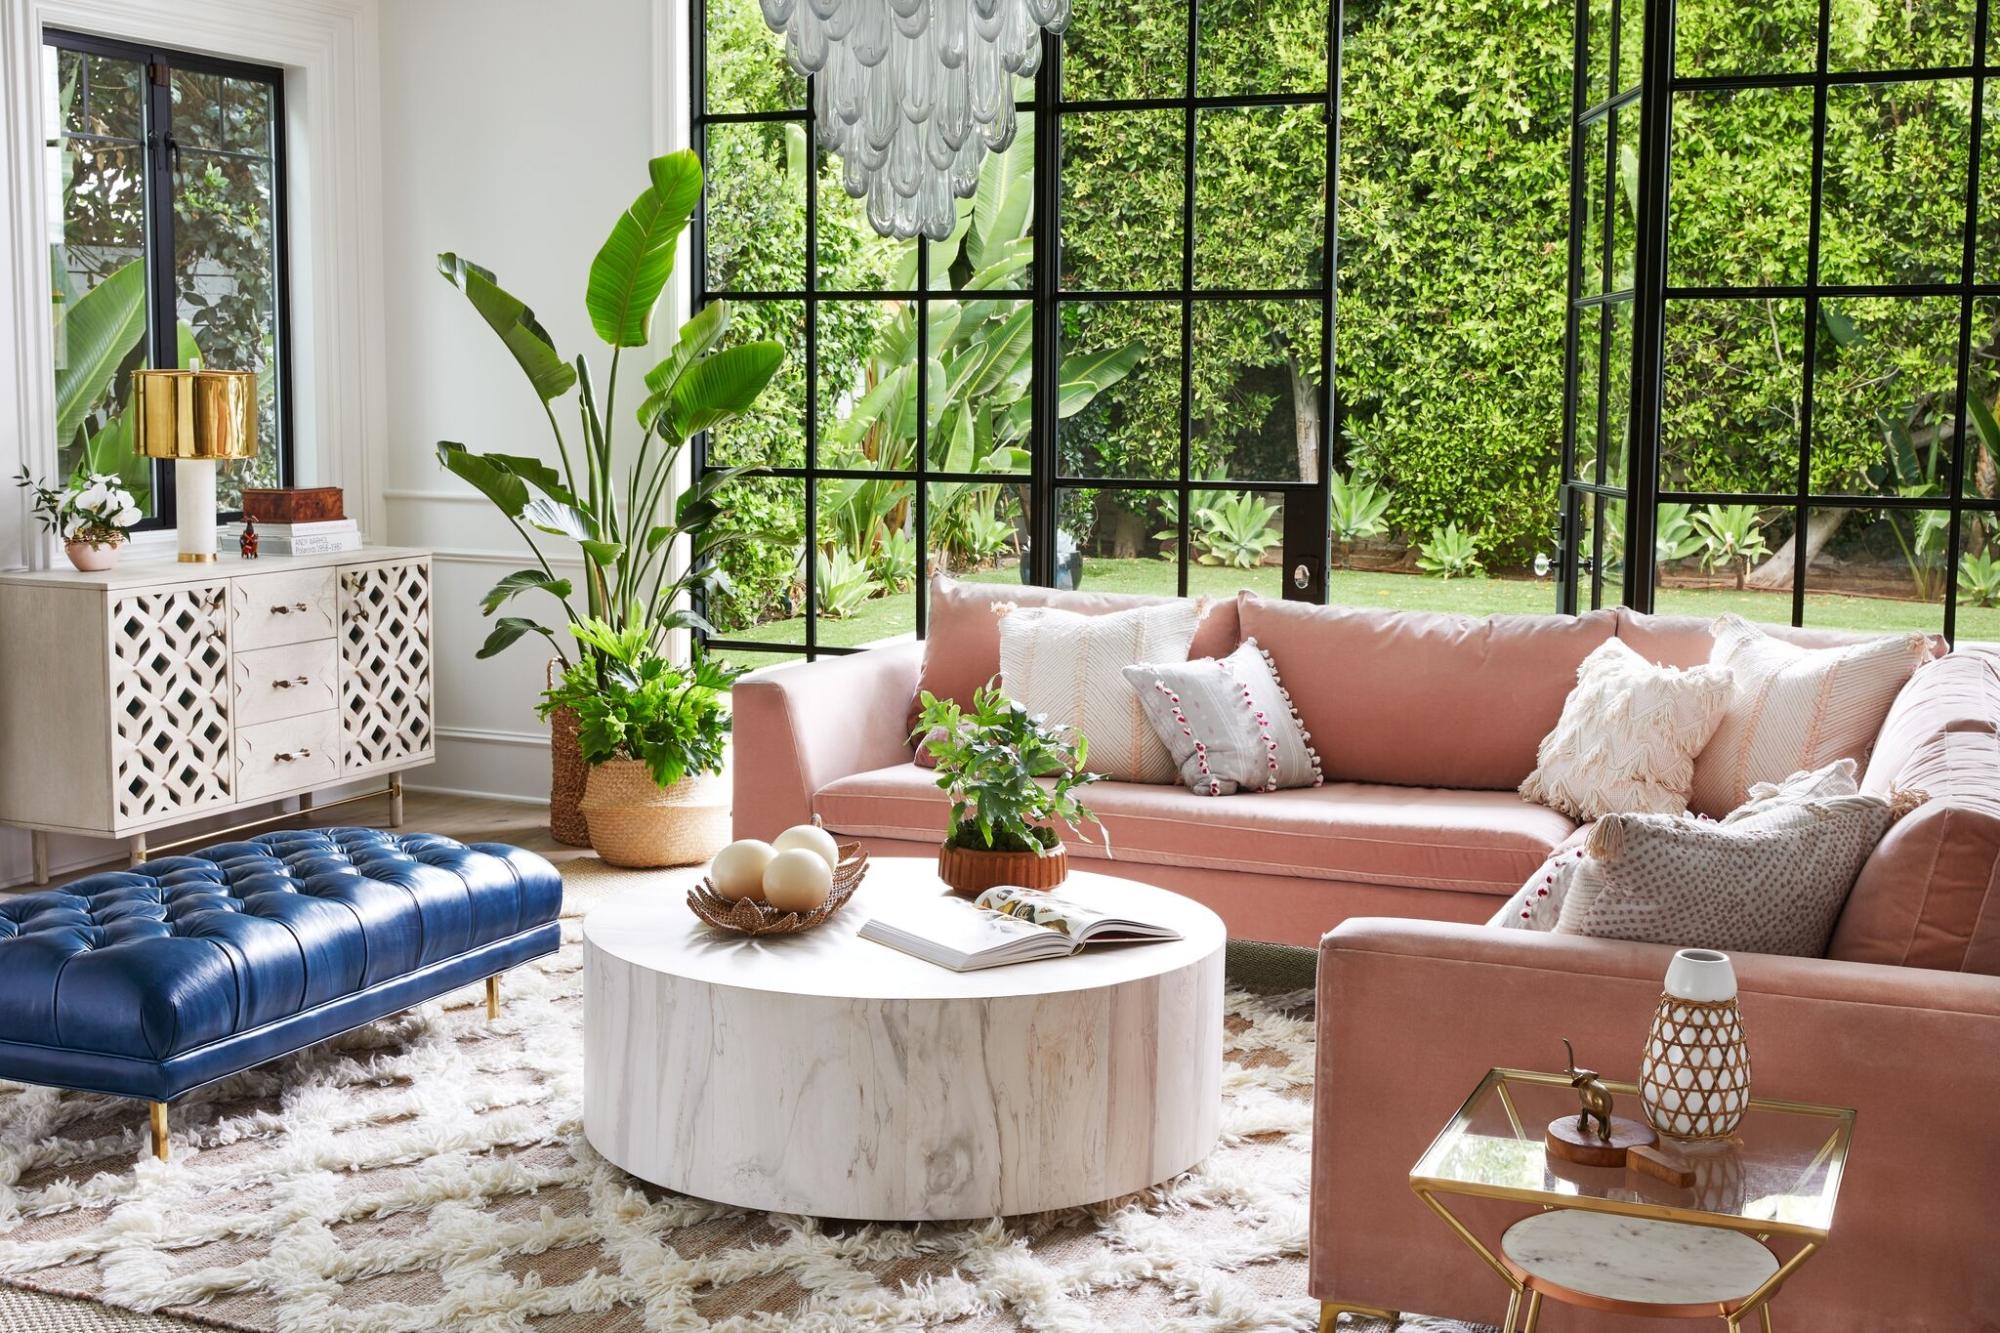 Gray Malinu0027s Living Room Reveal with